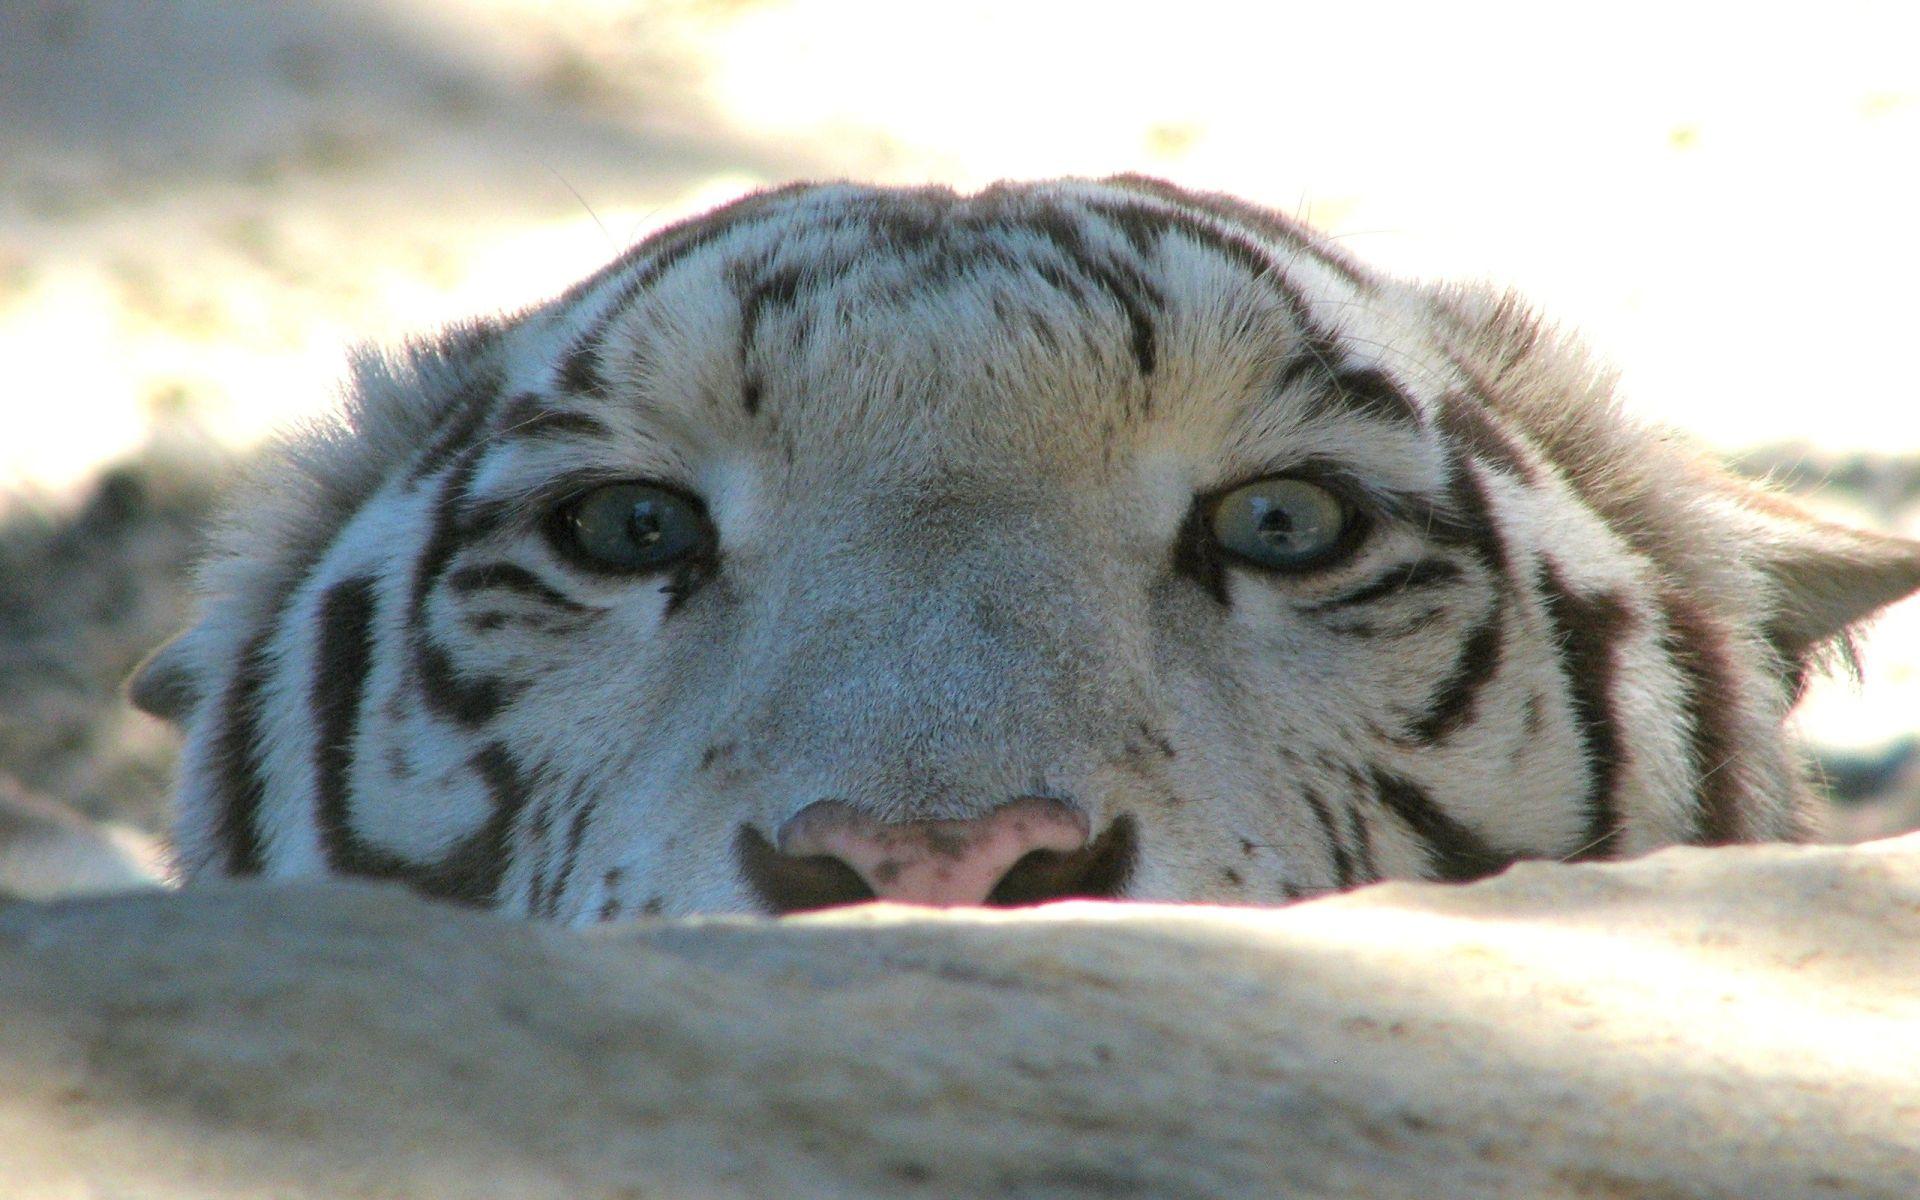 White Tiger looks out of ambush, Cool HD Wallpaper